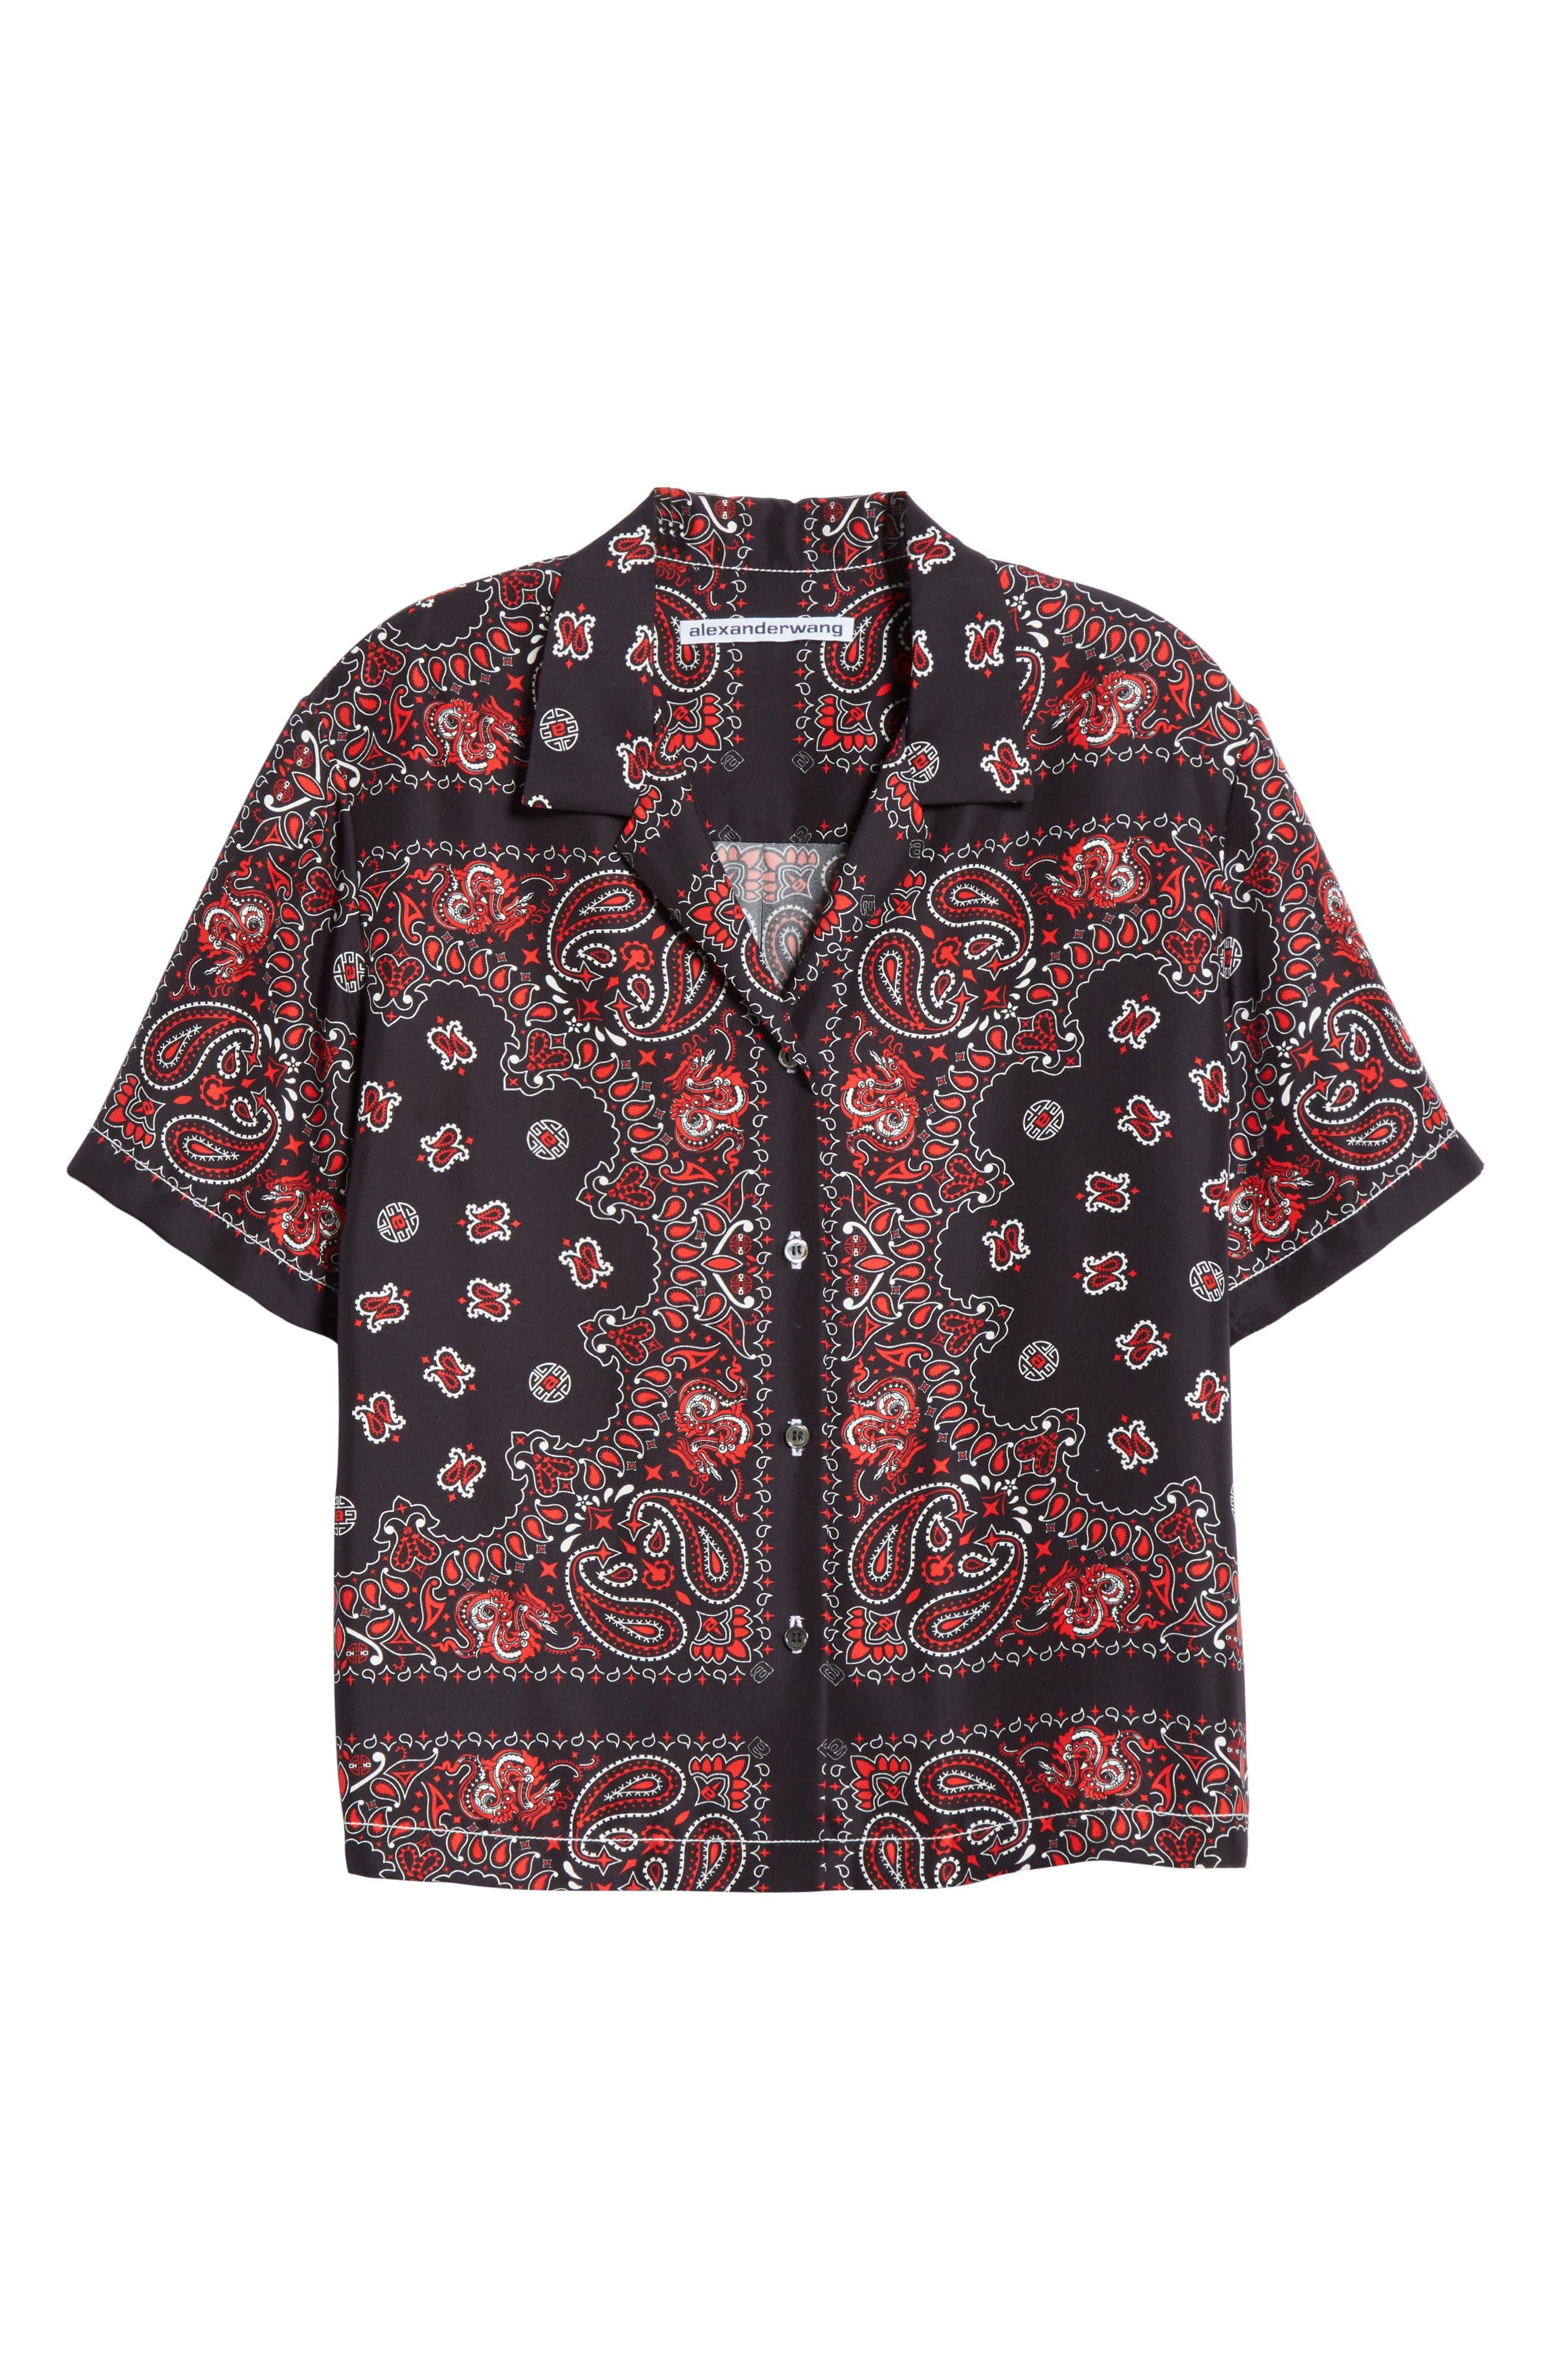 ALEXANDER WANG,                             Bandana Print Silk Shirt,                             Alternate thumbnail 7, color,                             BLACK/ RED